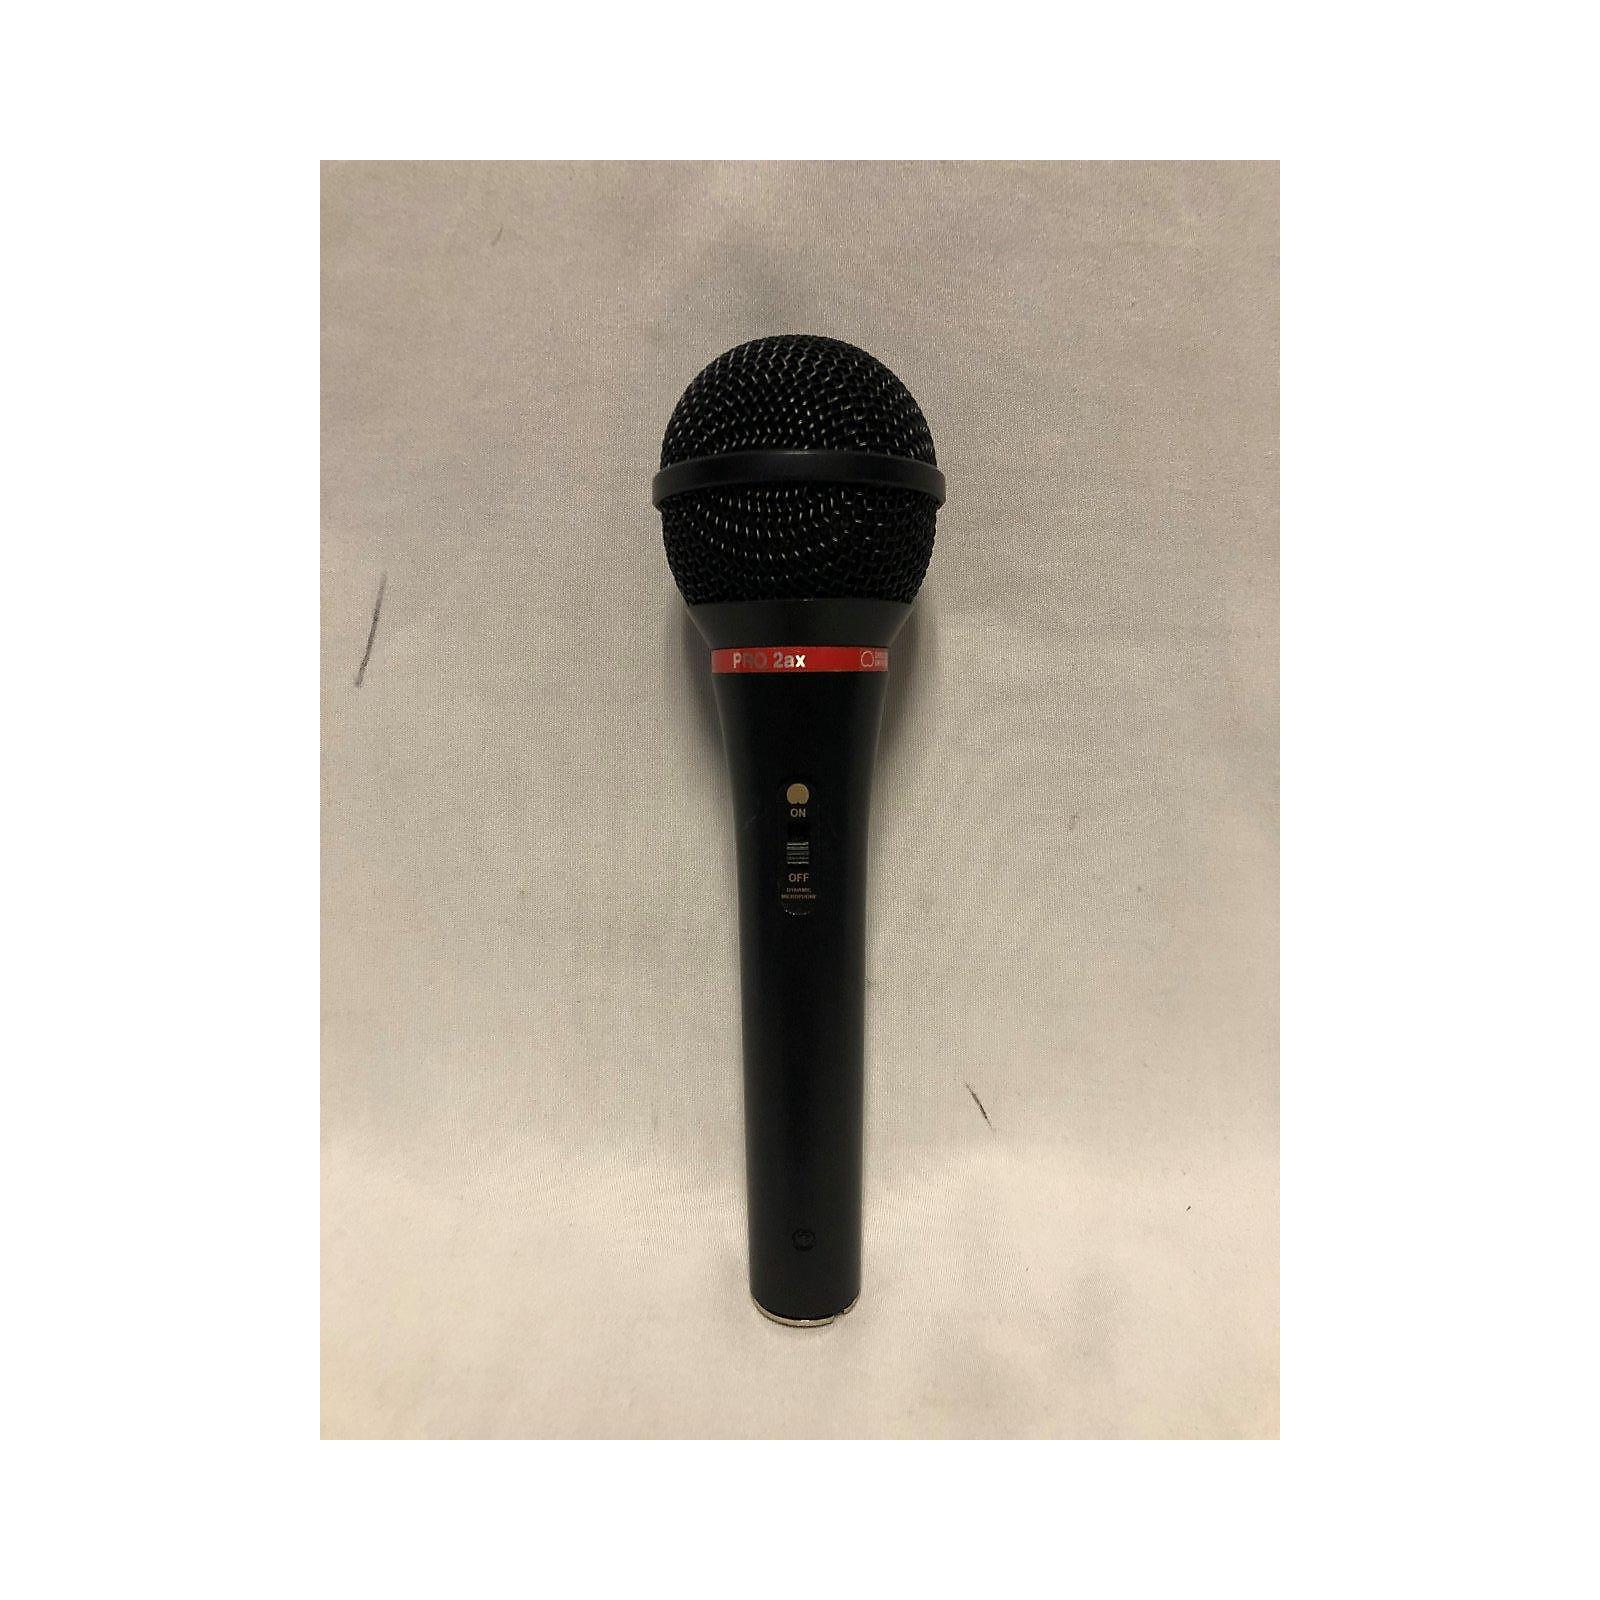 Audio-Technica PRO 2ax Dynamic Microphone